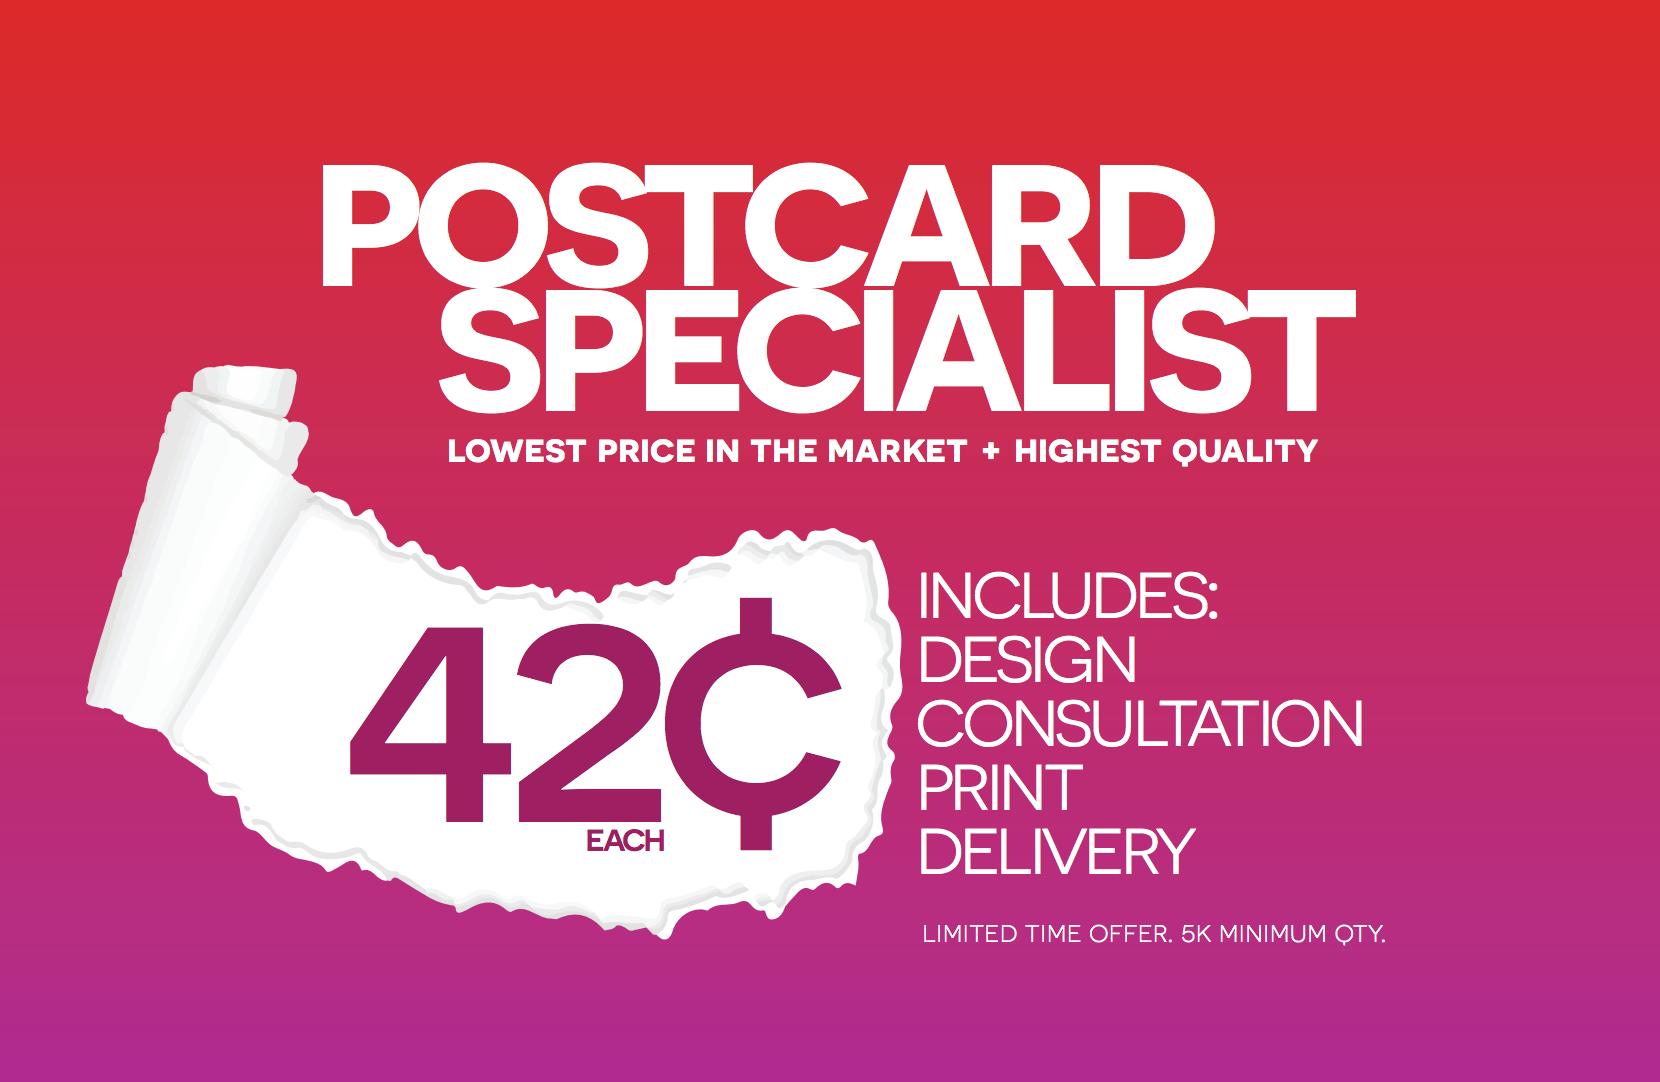 postcard specialists